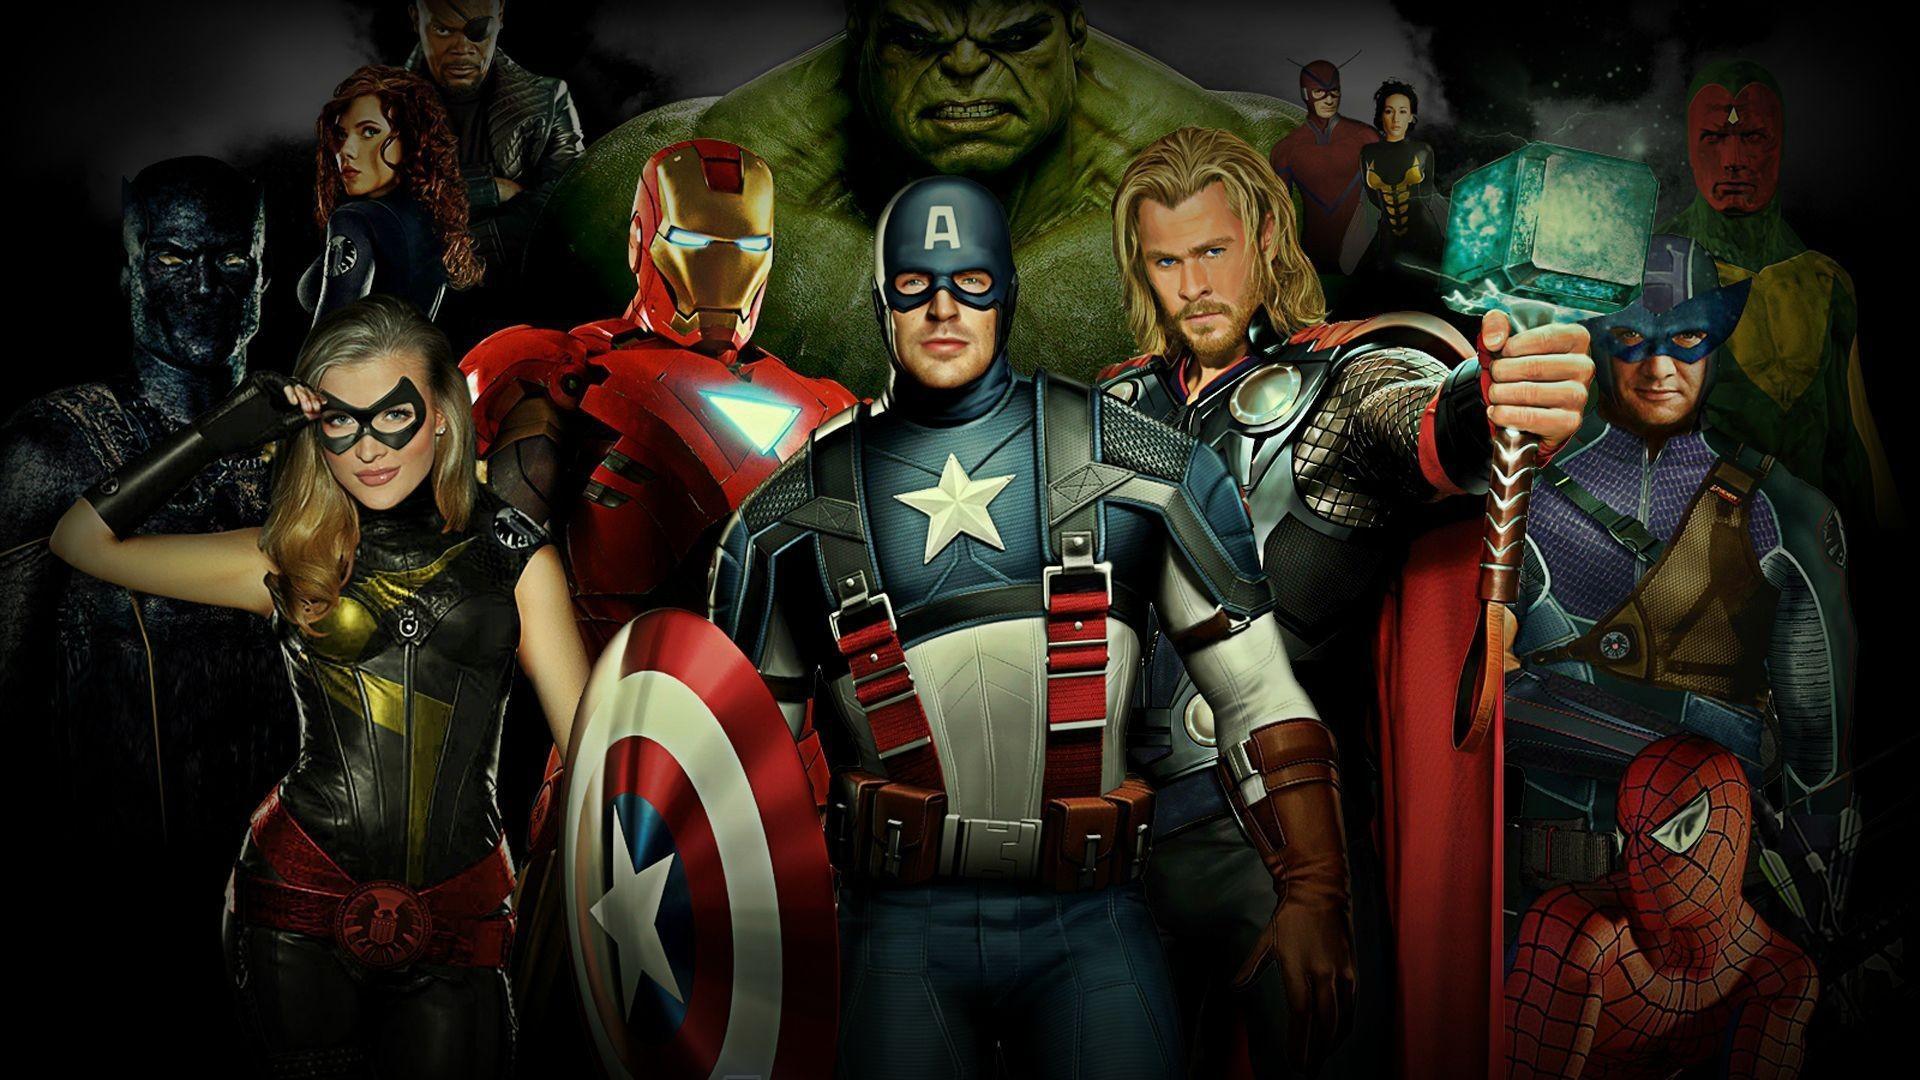 Avengers Assemble Wallpaper Superheroes Wallpaper Free